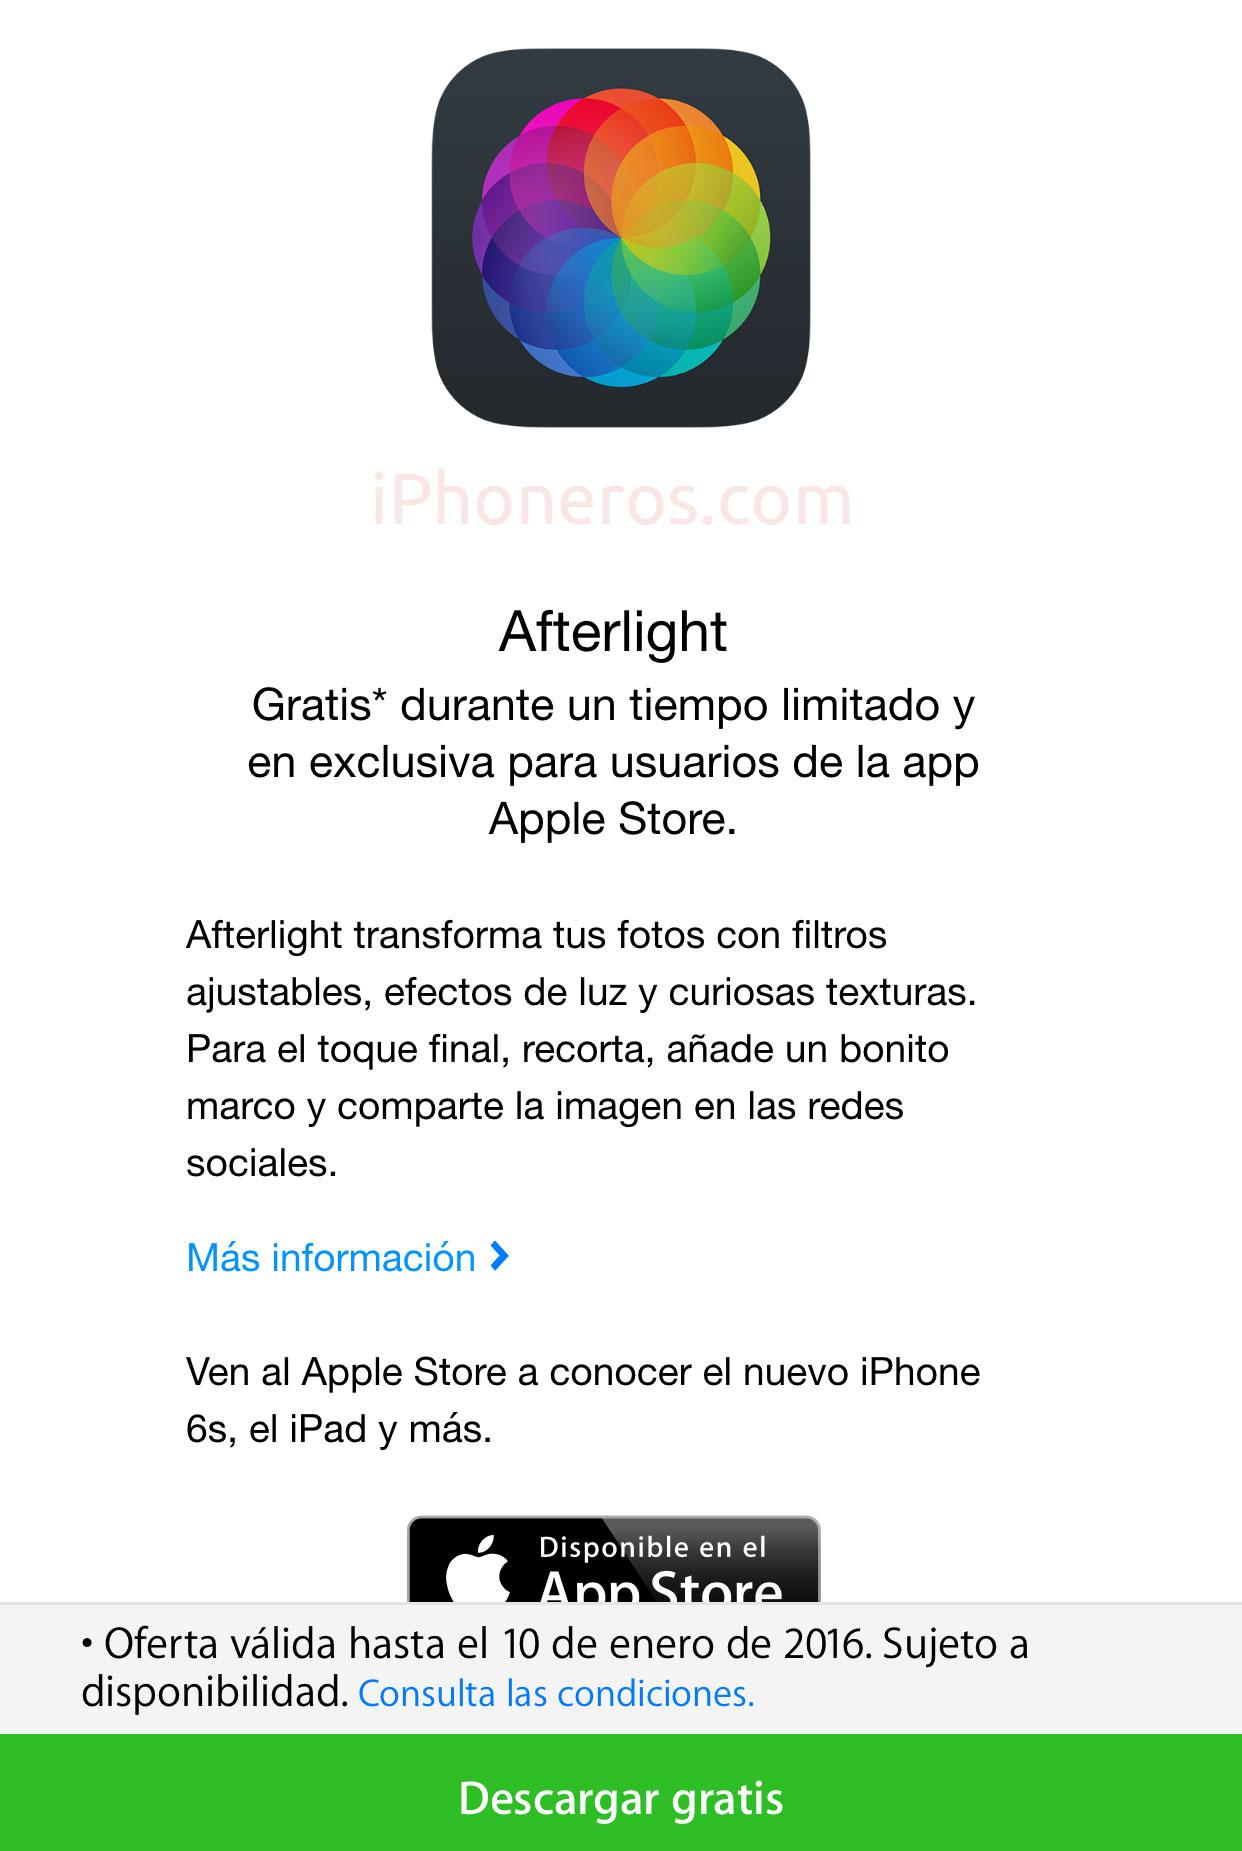 Afterlight gratis